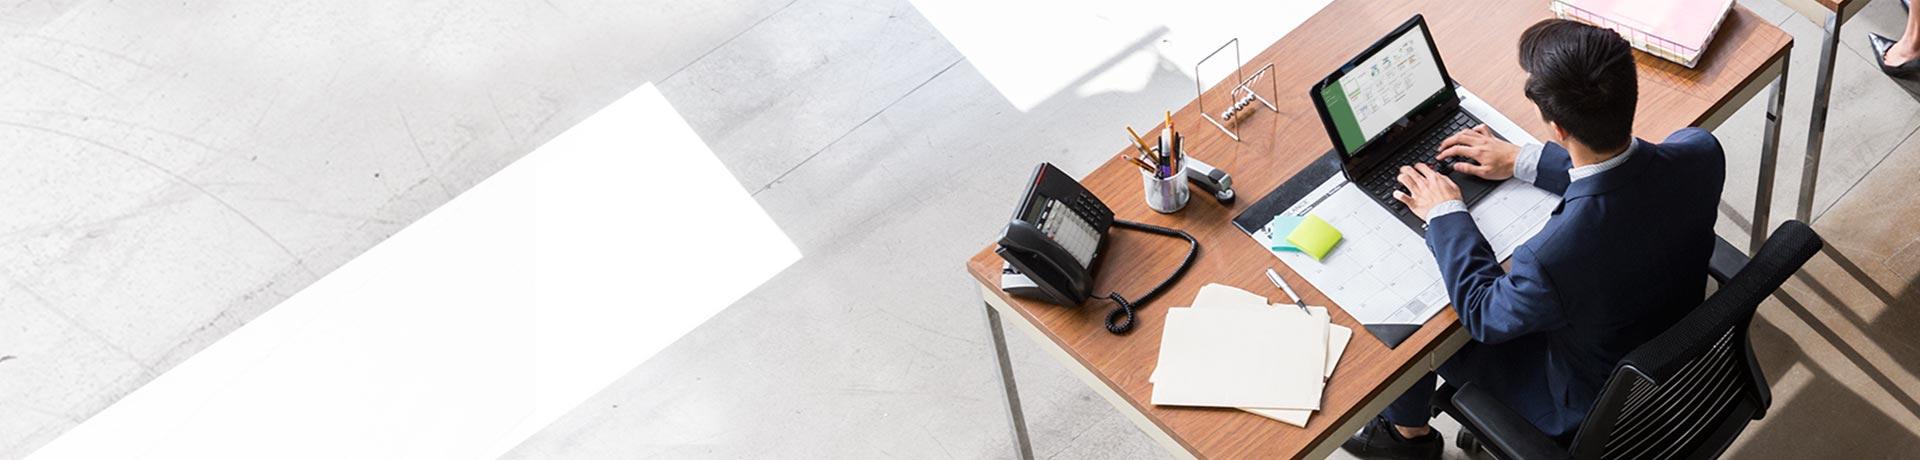 Мужчина сидит за столом в кабинете и работает с файлом Microsoft Project на ноутбуке.